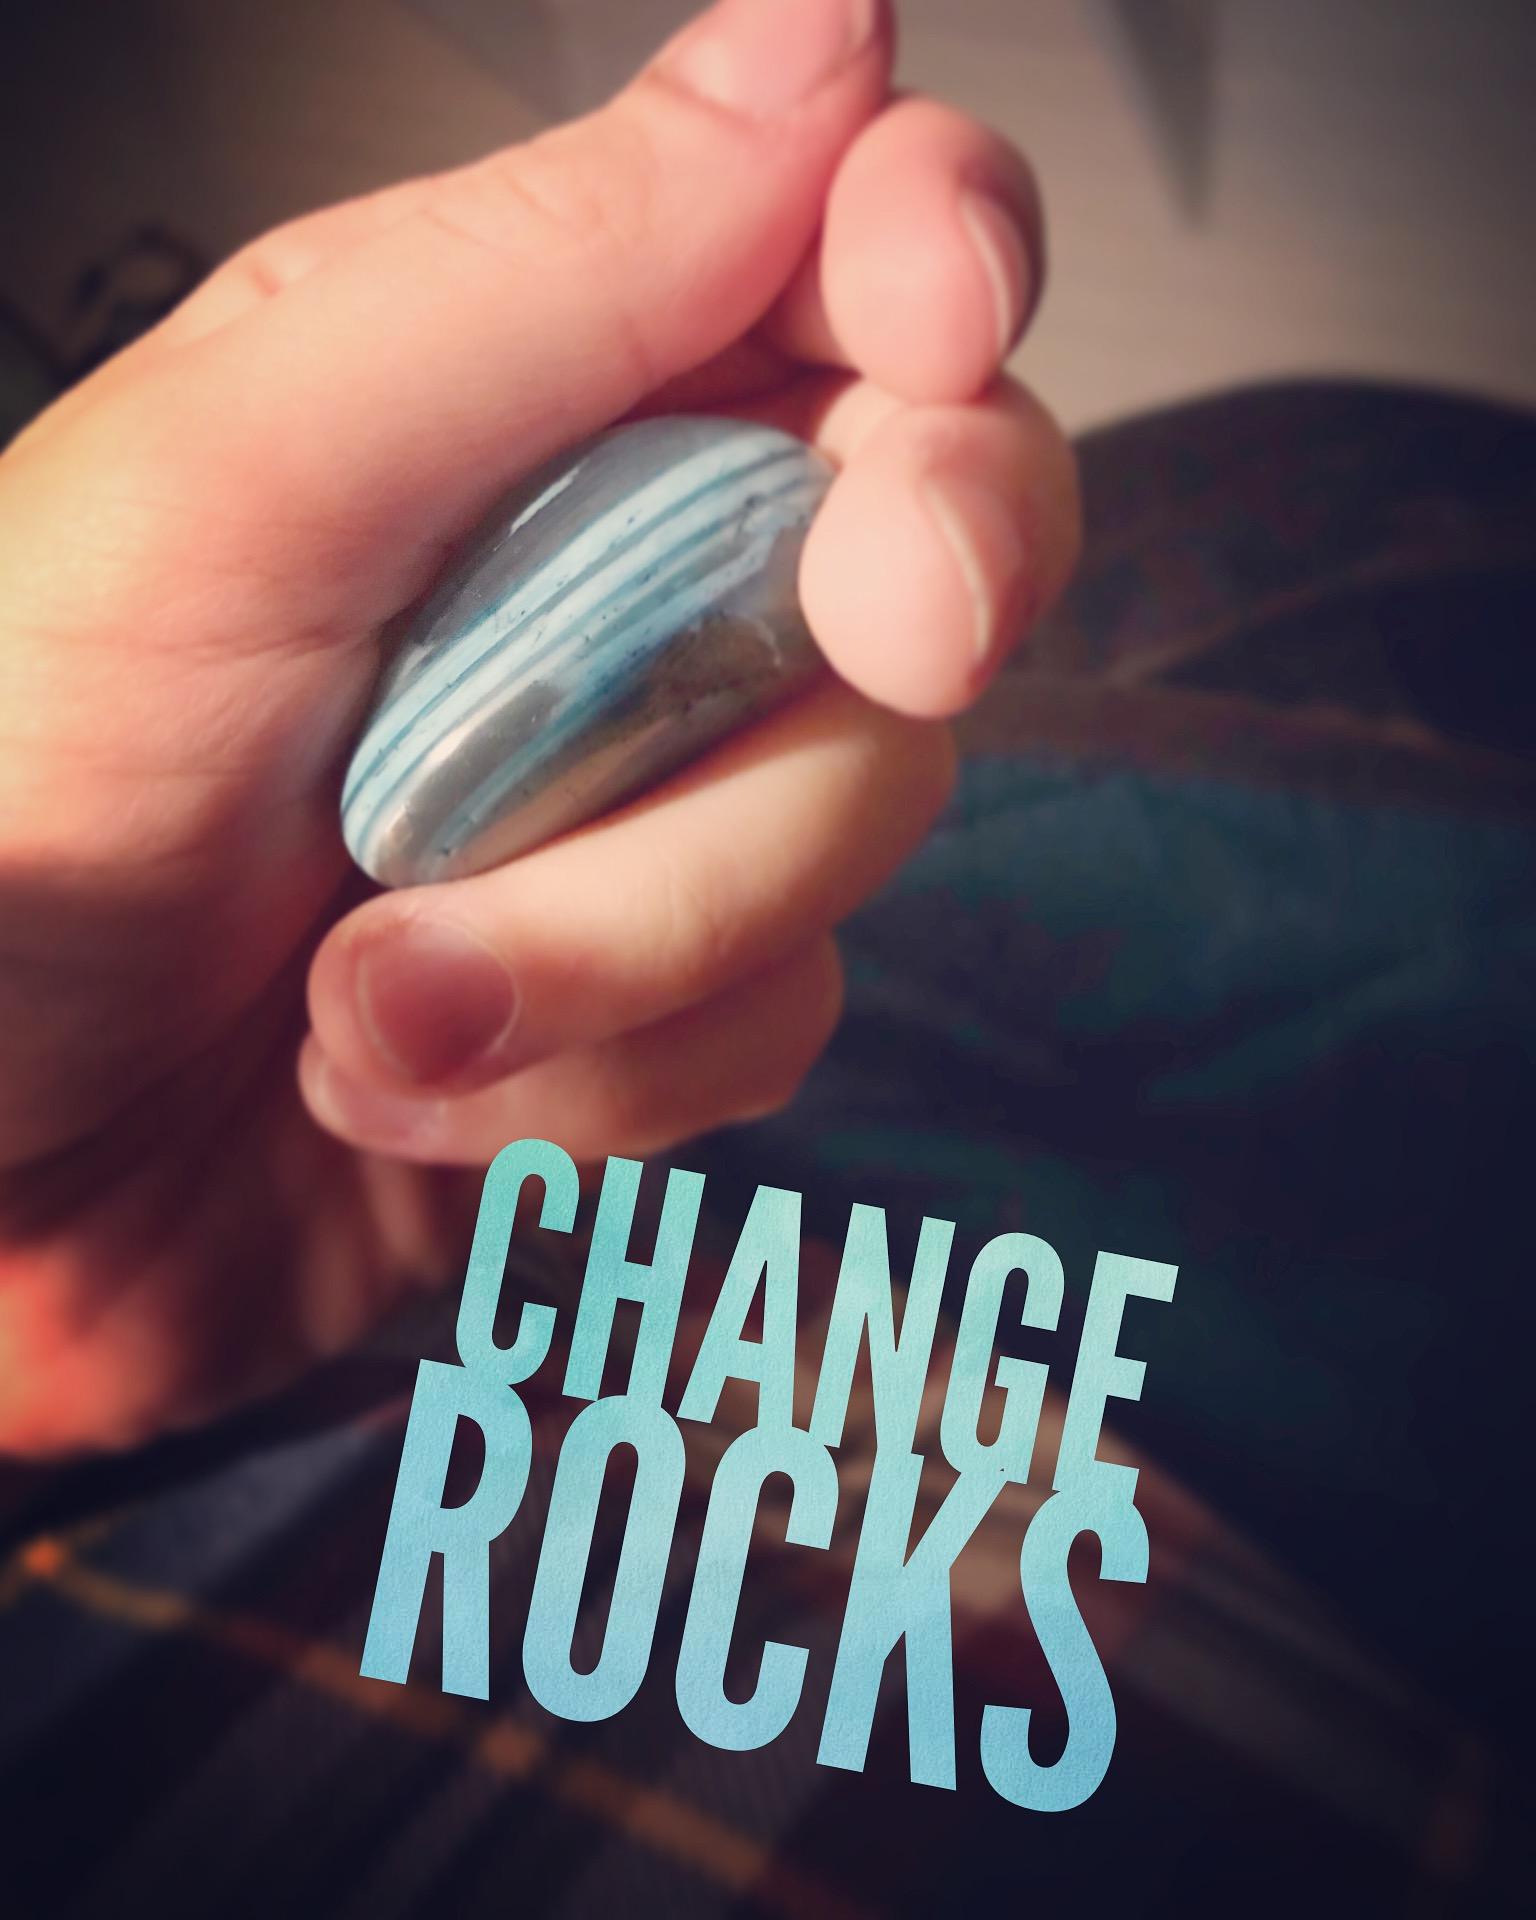 20180104 on making a change (rocks) Isa olsson.jpeg